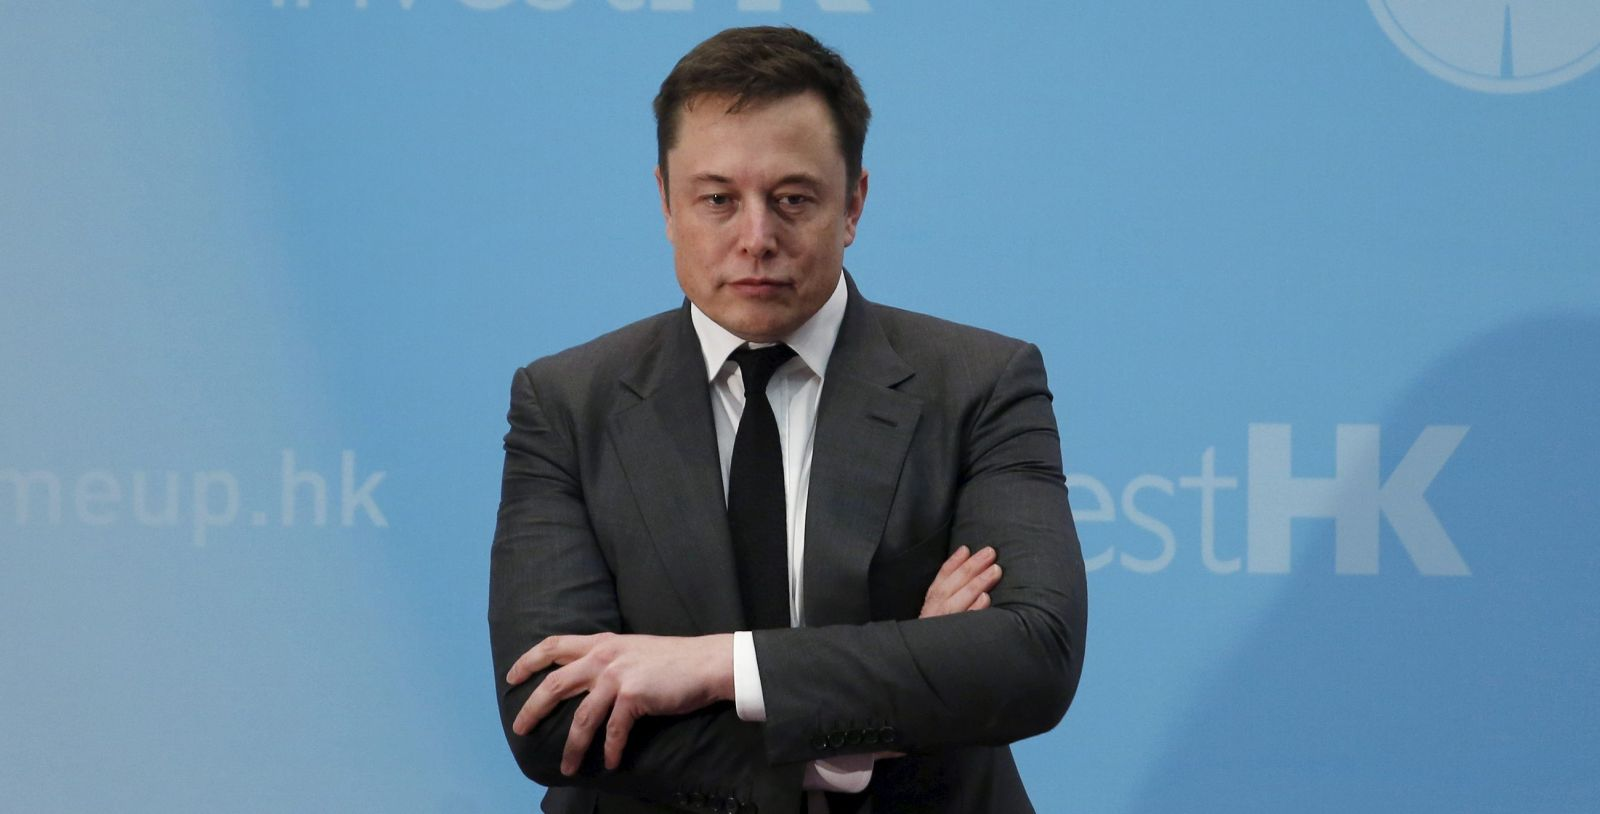 Tesla Chief Executive Elon Musk at a forum on startups in Hong Kong, China January 26, 2016.